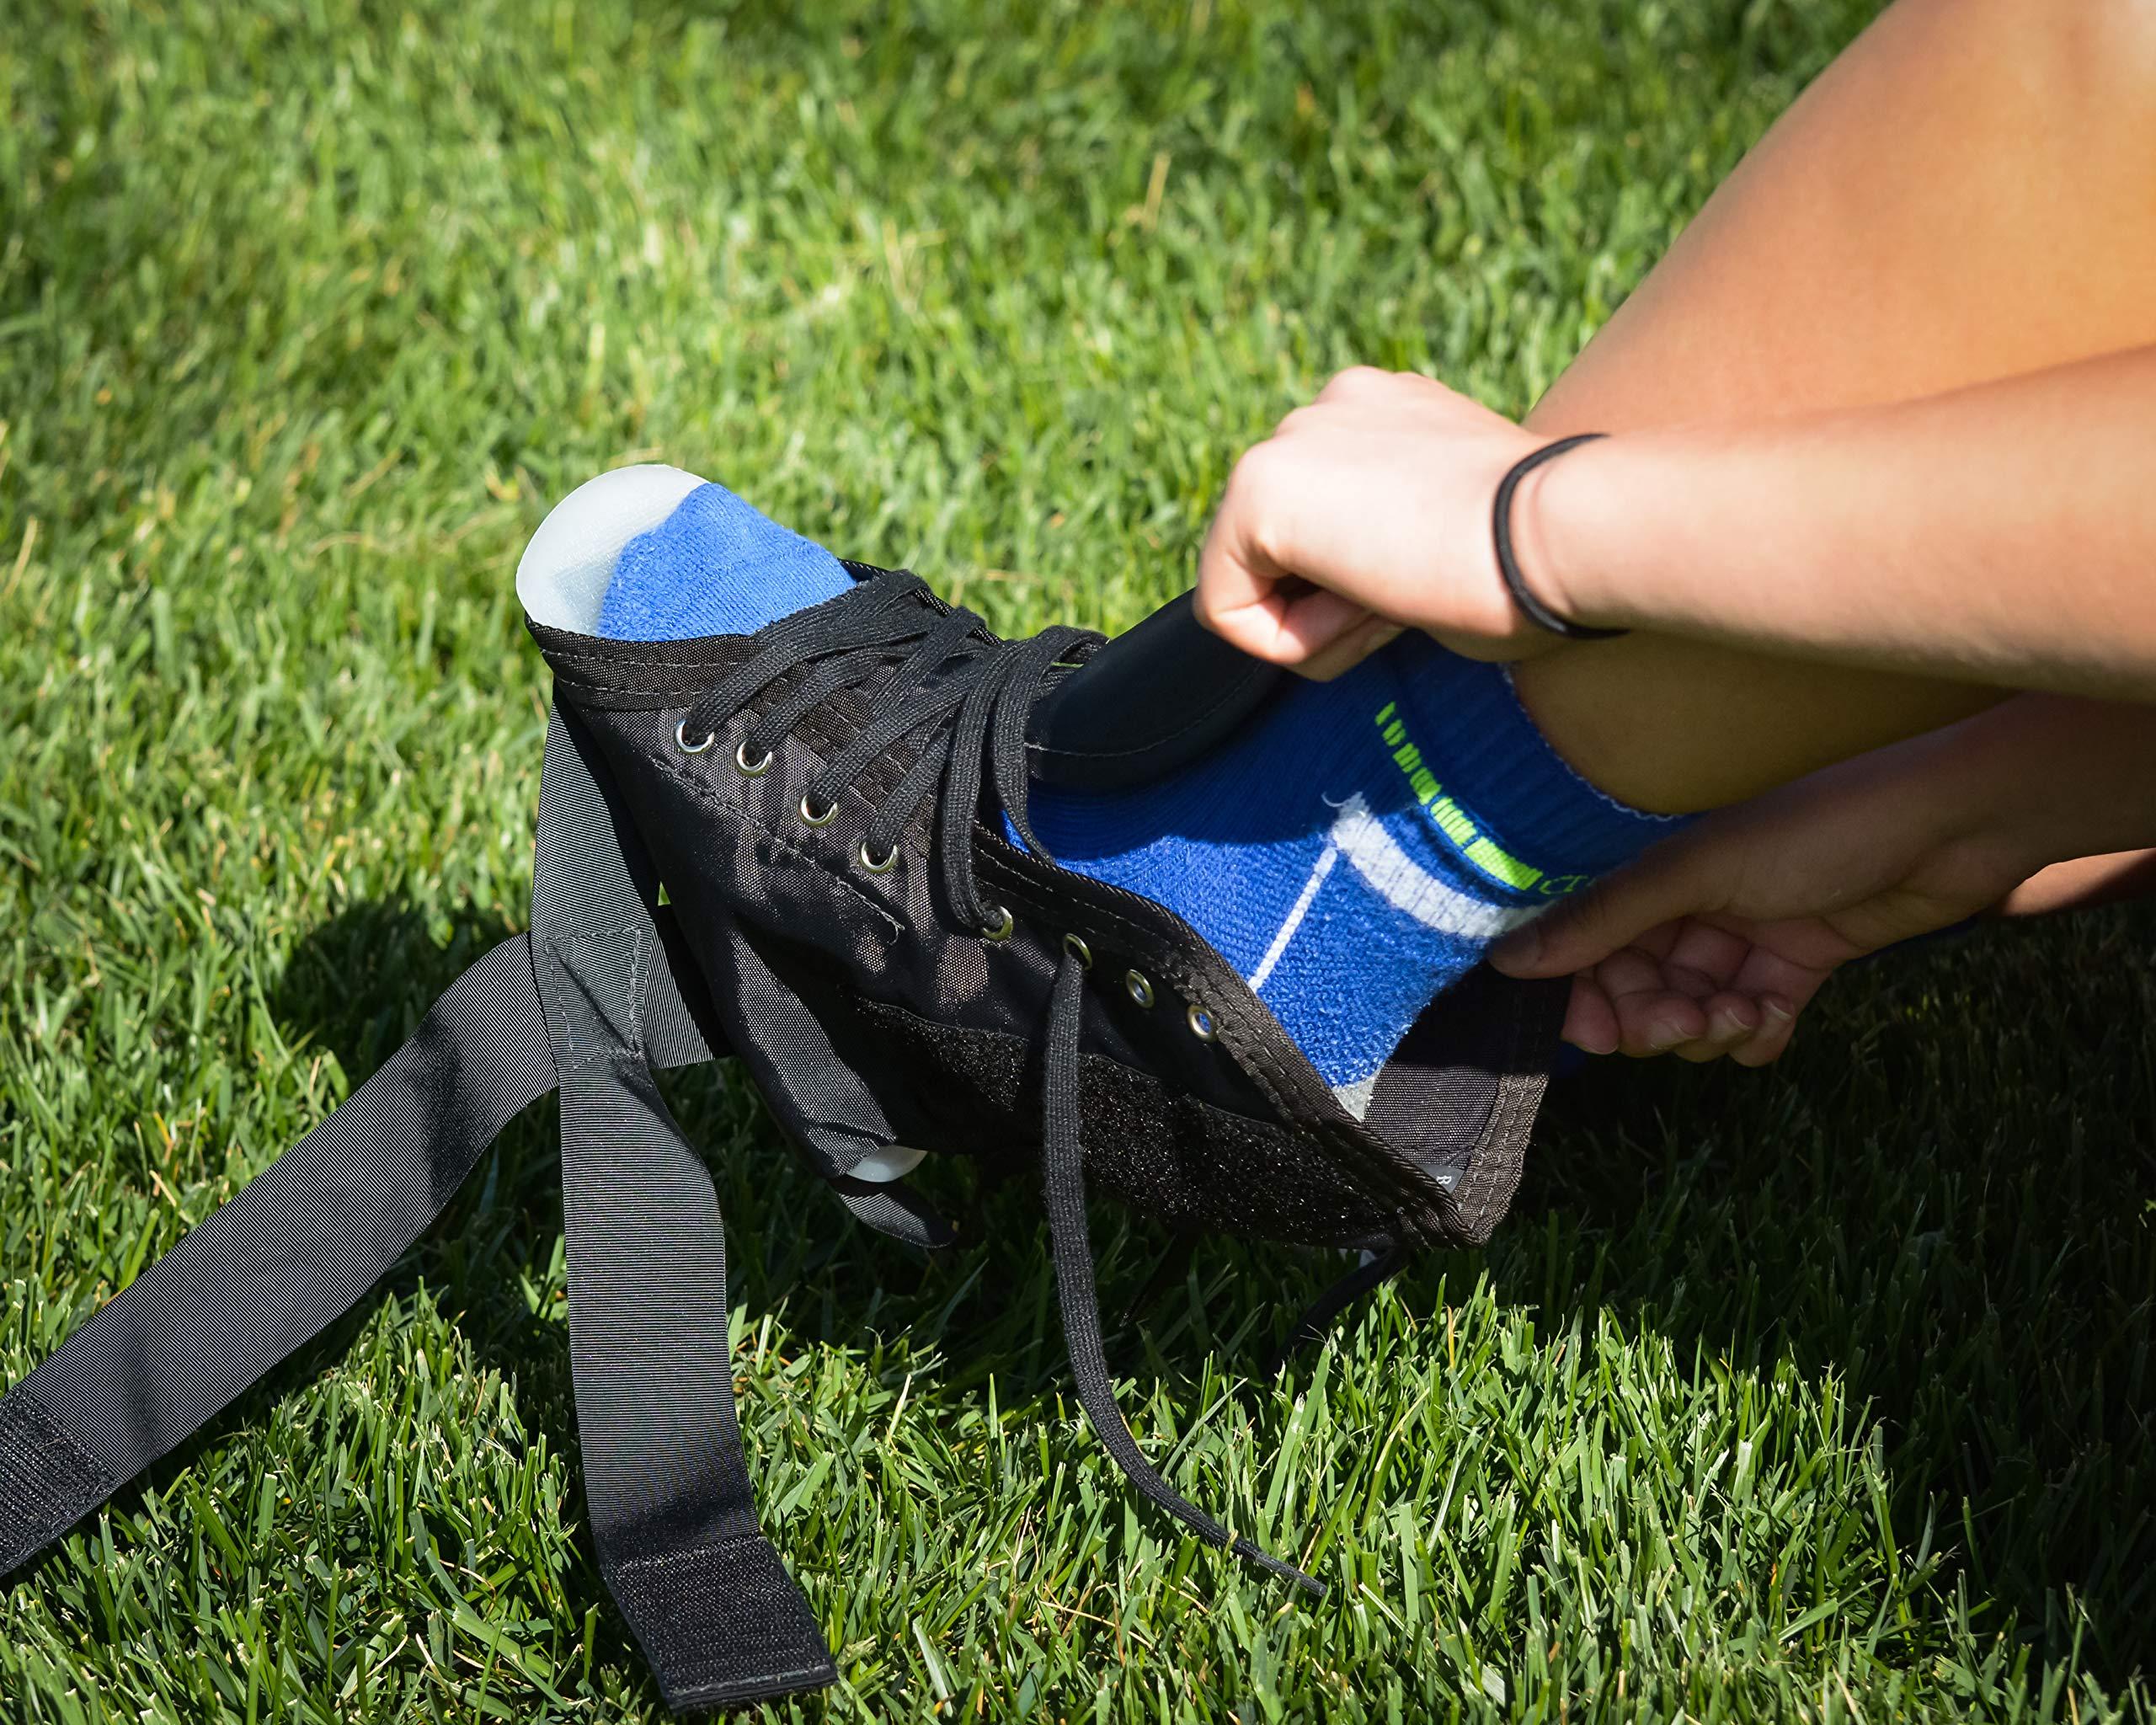 Badger Ankle Braces (Men's 10 Right) by Badger Braces, LLC (Image #2)